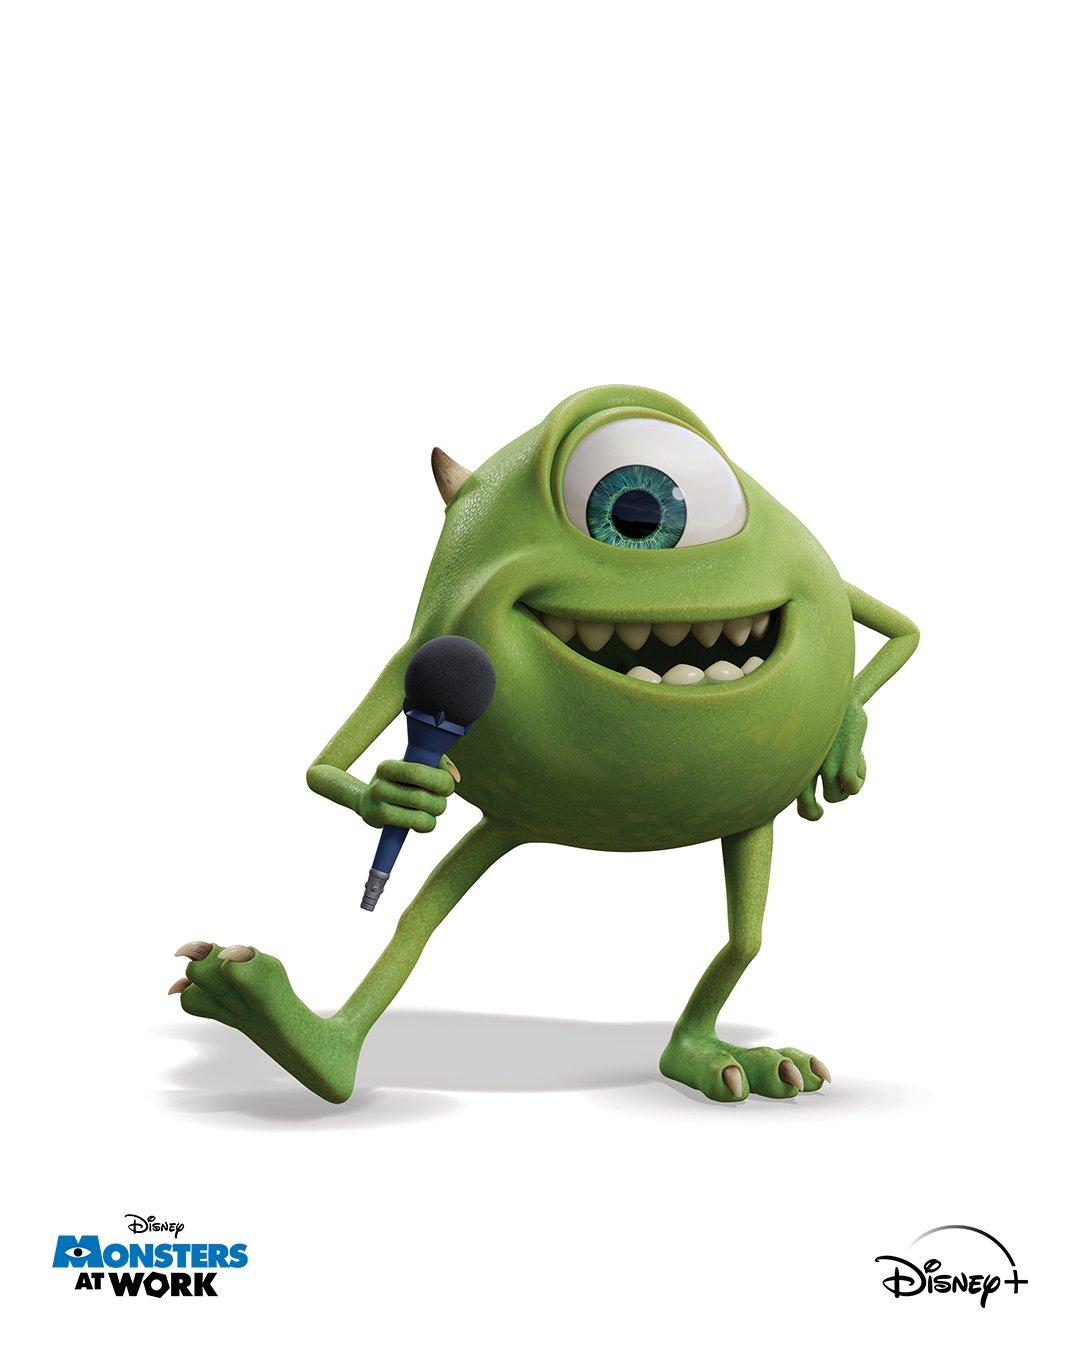 Monstres & Cie : Au Travail [Disney Television - 2020] EwsXRxPUUAIZTwJ?format=jpg&name=large